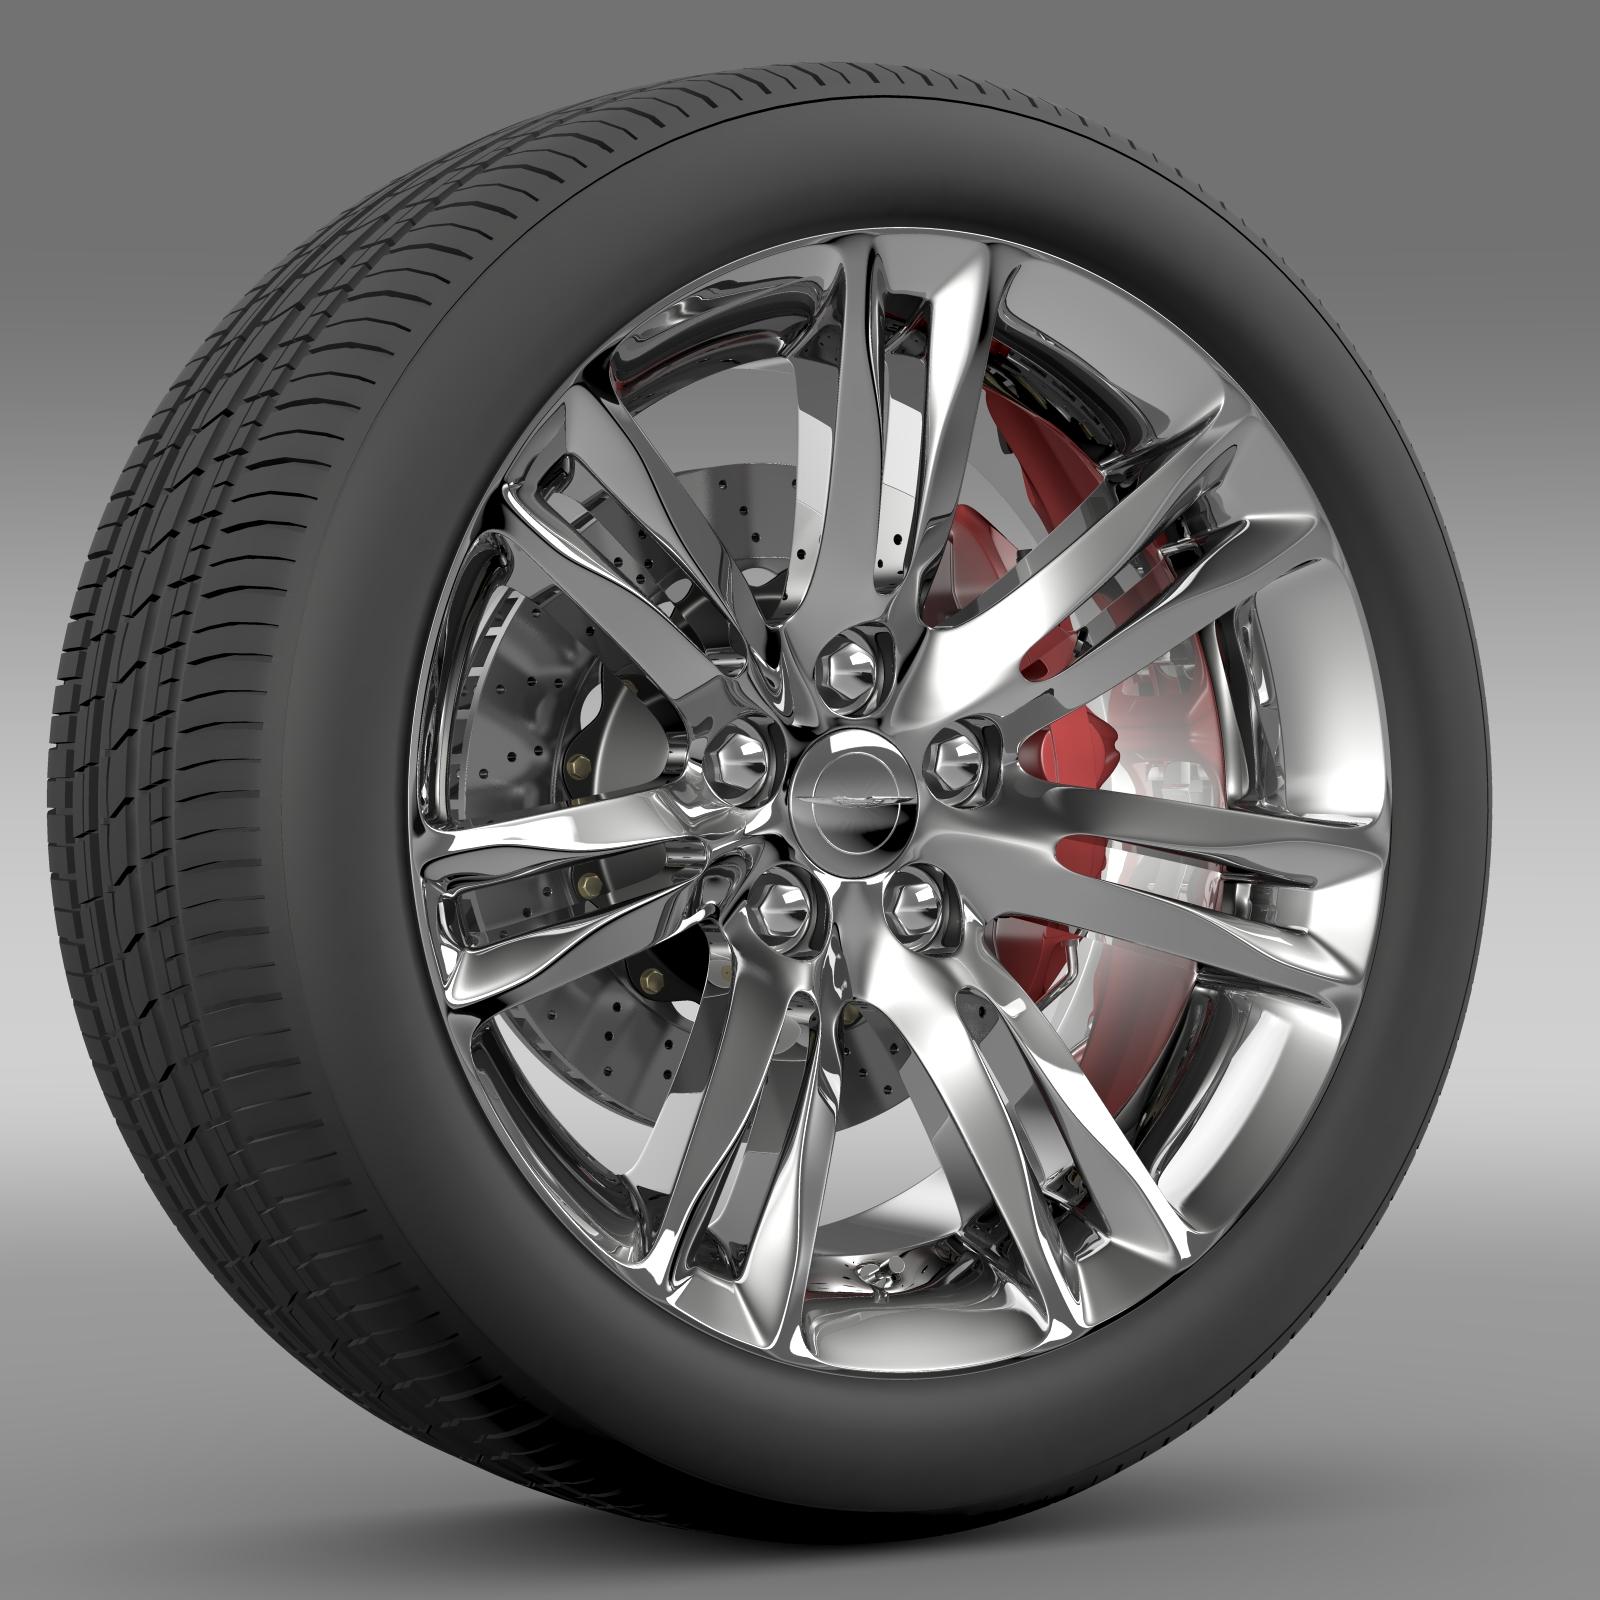 chrysler 300c 2015 wheel 3d model 3ds max fbx c4d lwo ma mb hrc xsi obj 212762